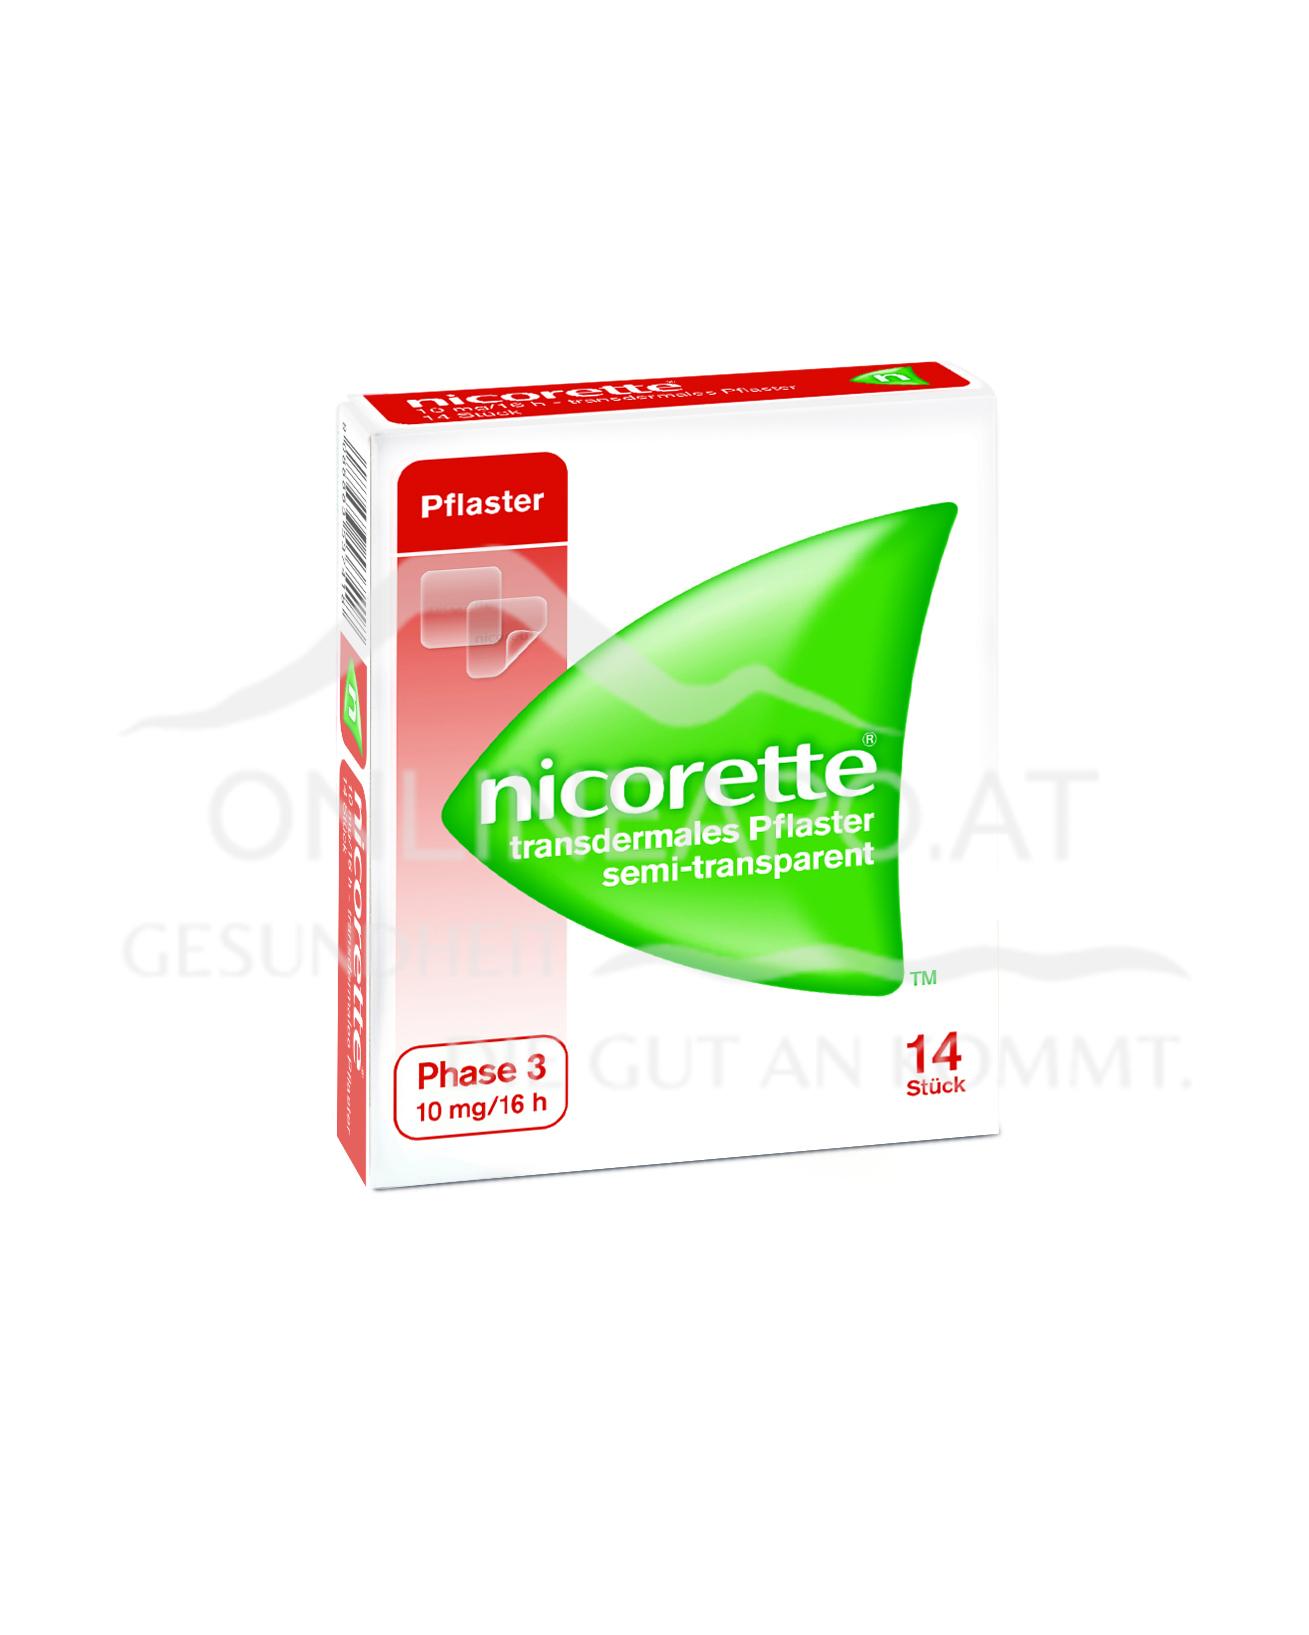 Nicorette® Transdermales Pflaster 10mg/16h